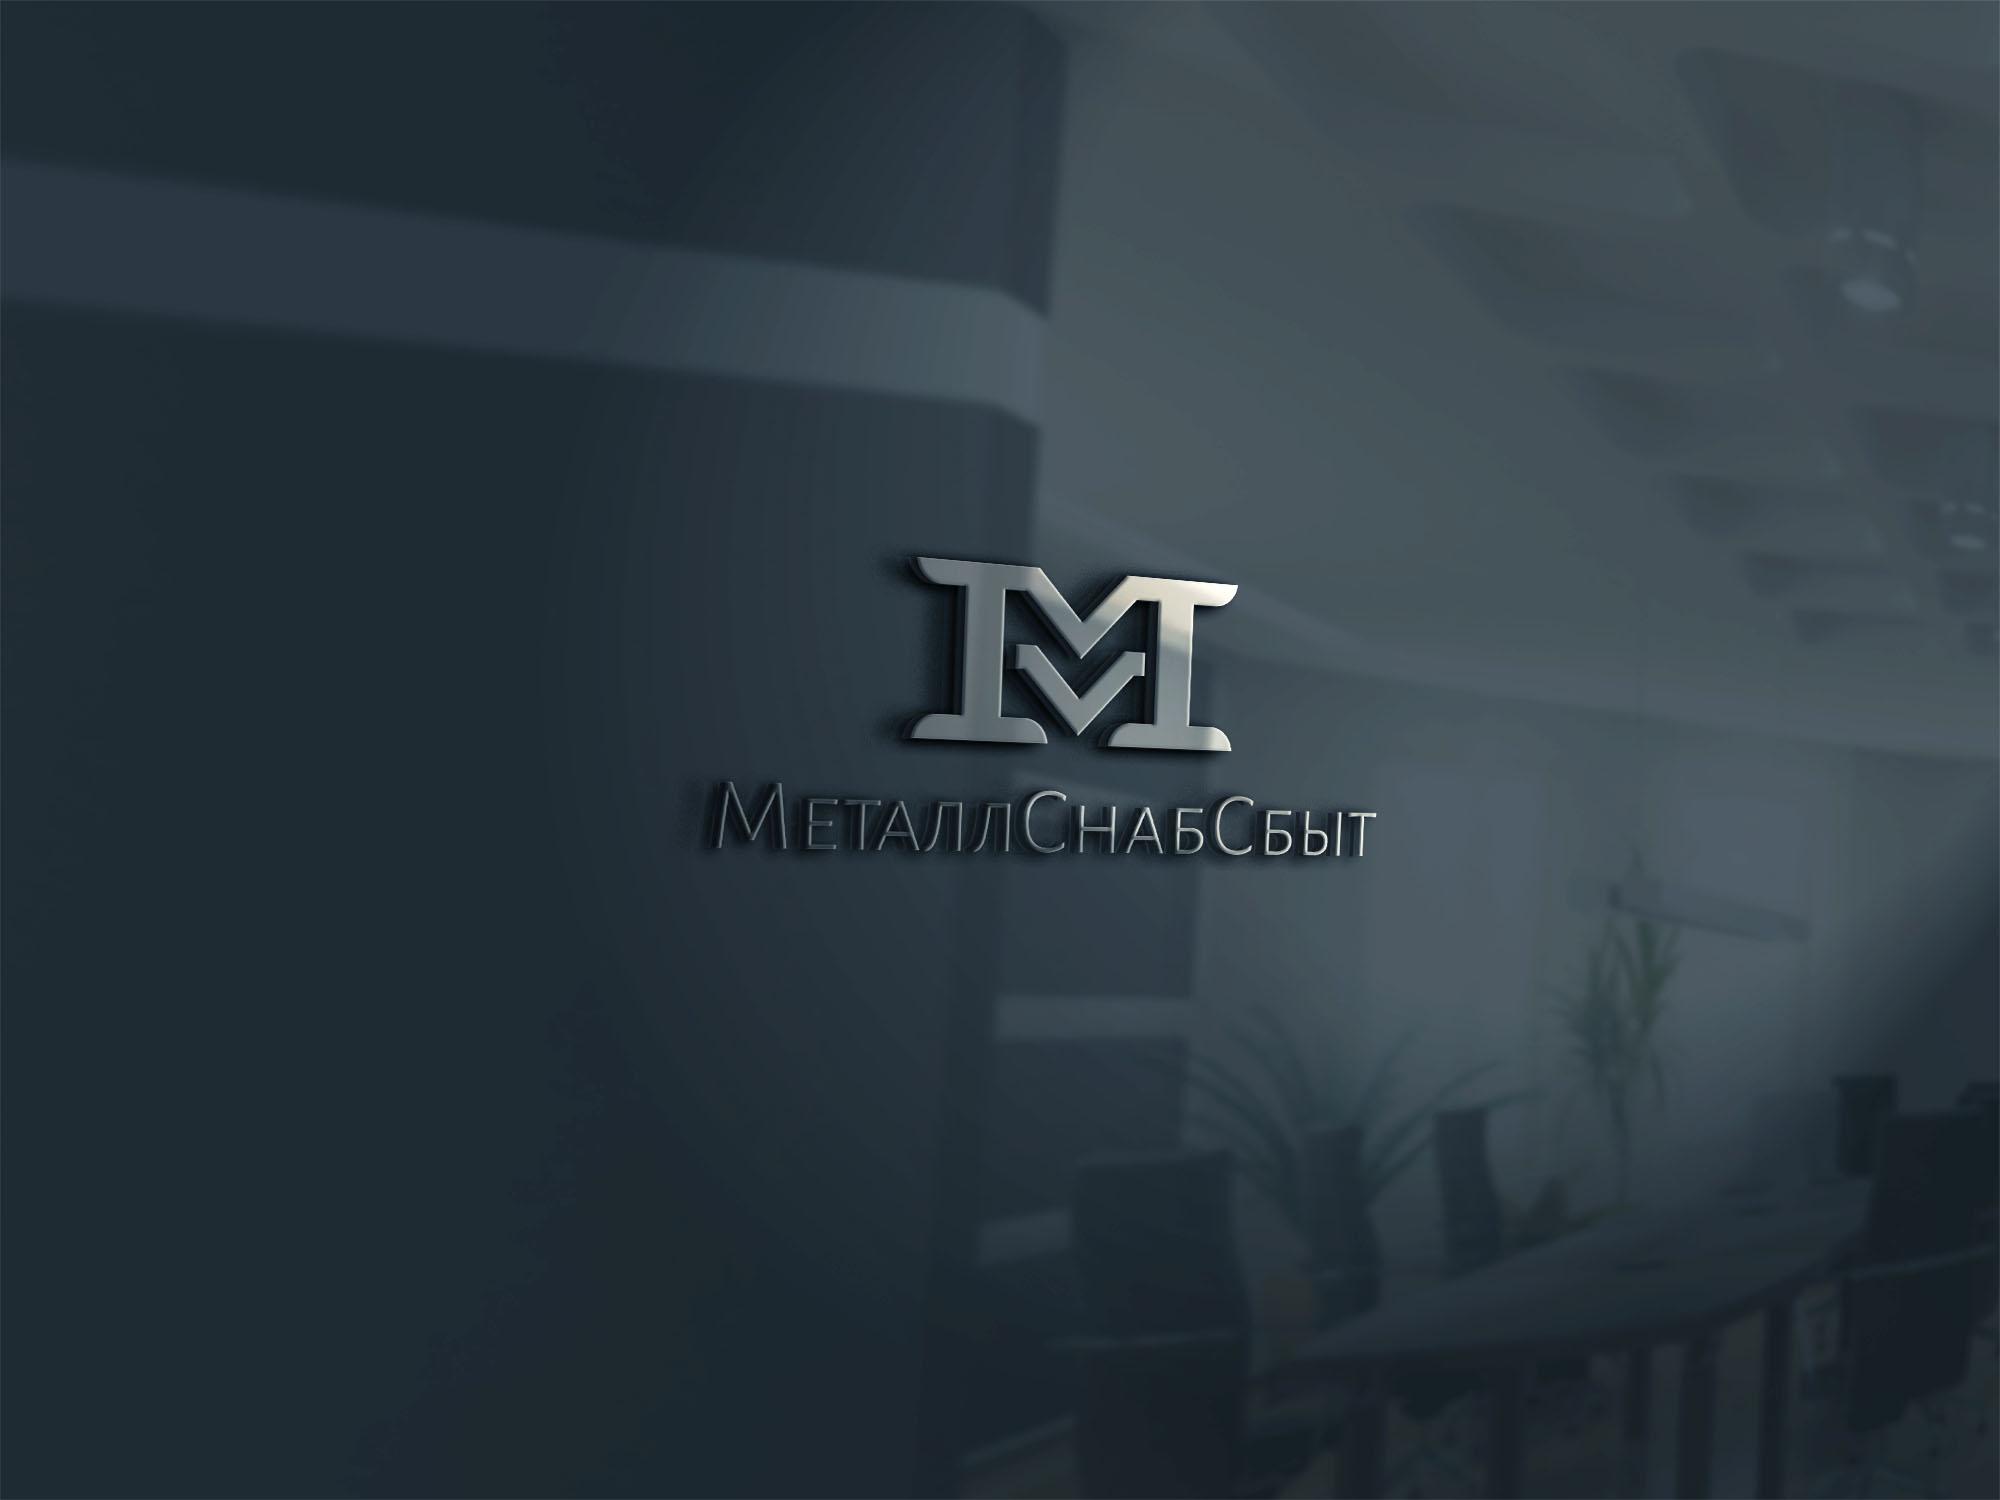 Создание фирменного стиля + логотип фото f_1725cfbb843b3af3.jpg